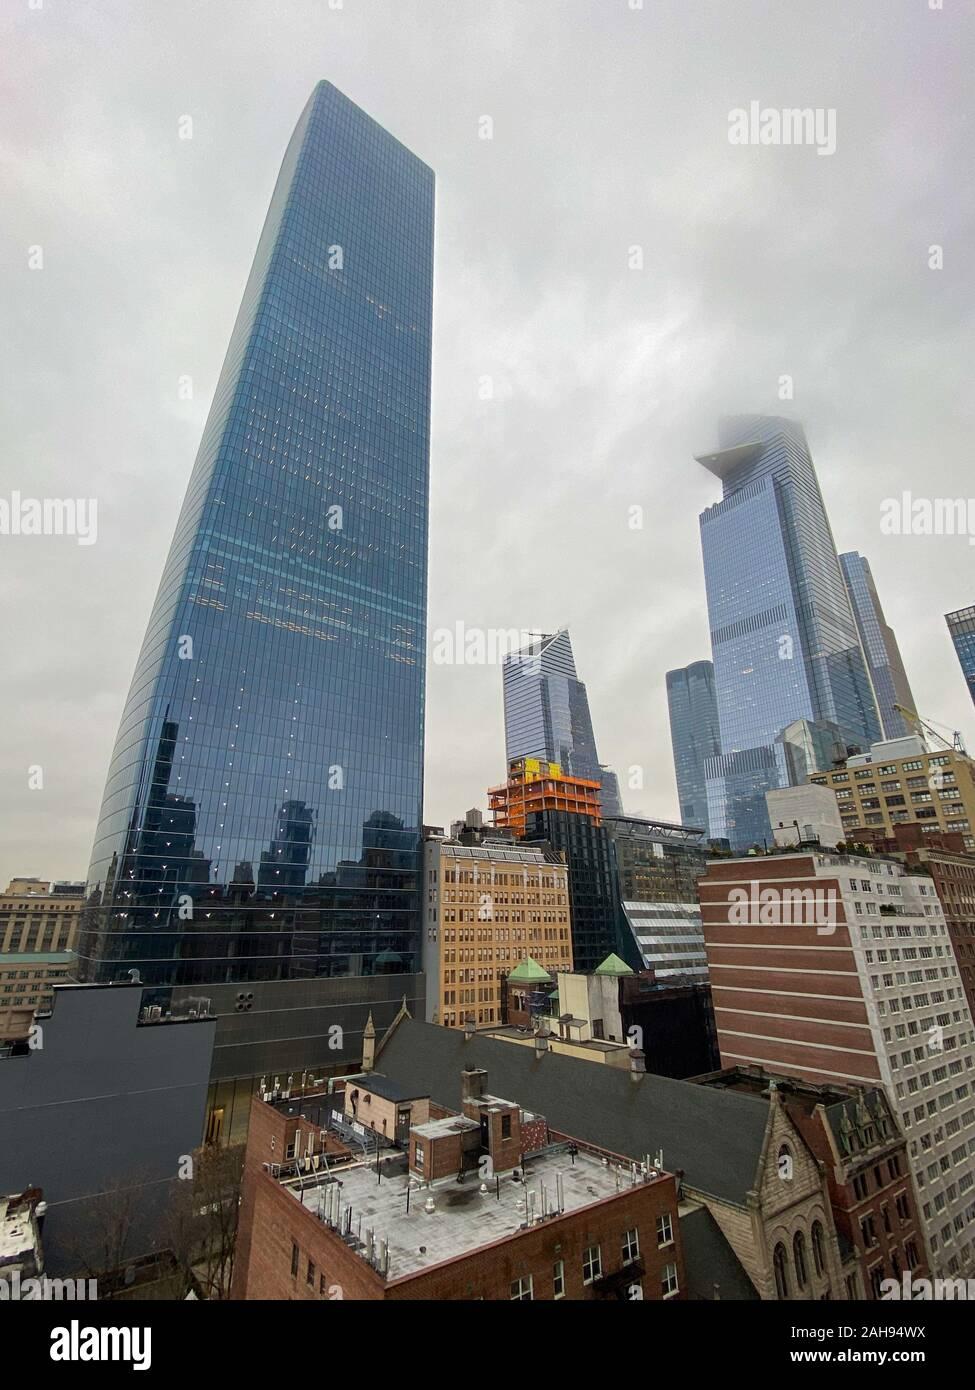 New York City - Dec 13, 2019: Modern high-rises in Hudson Yards, New York City. Stock Photo